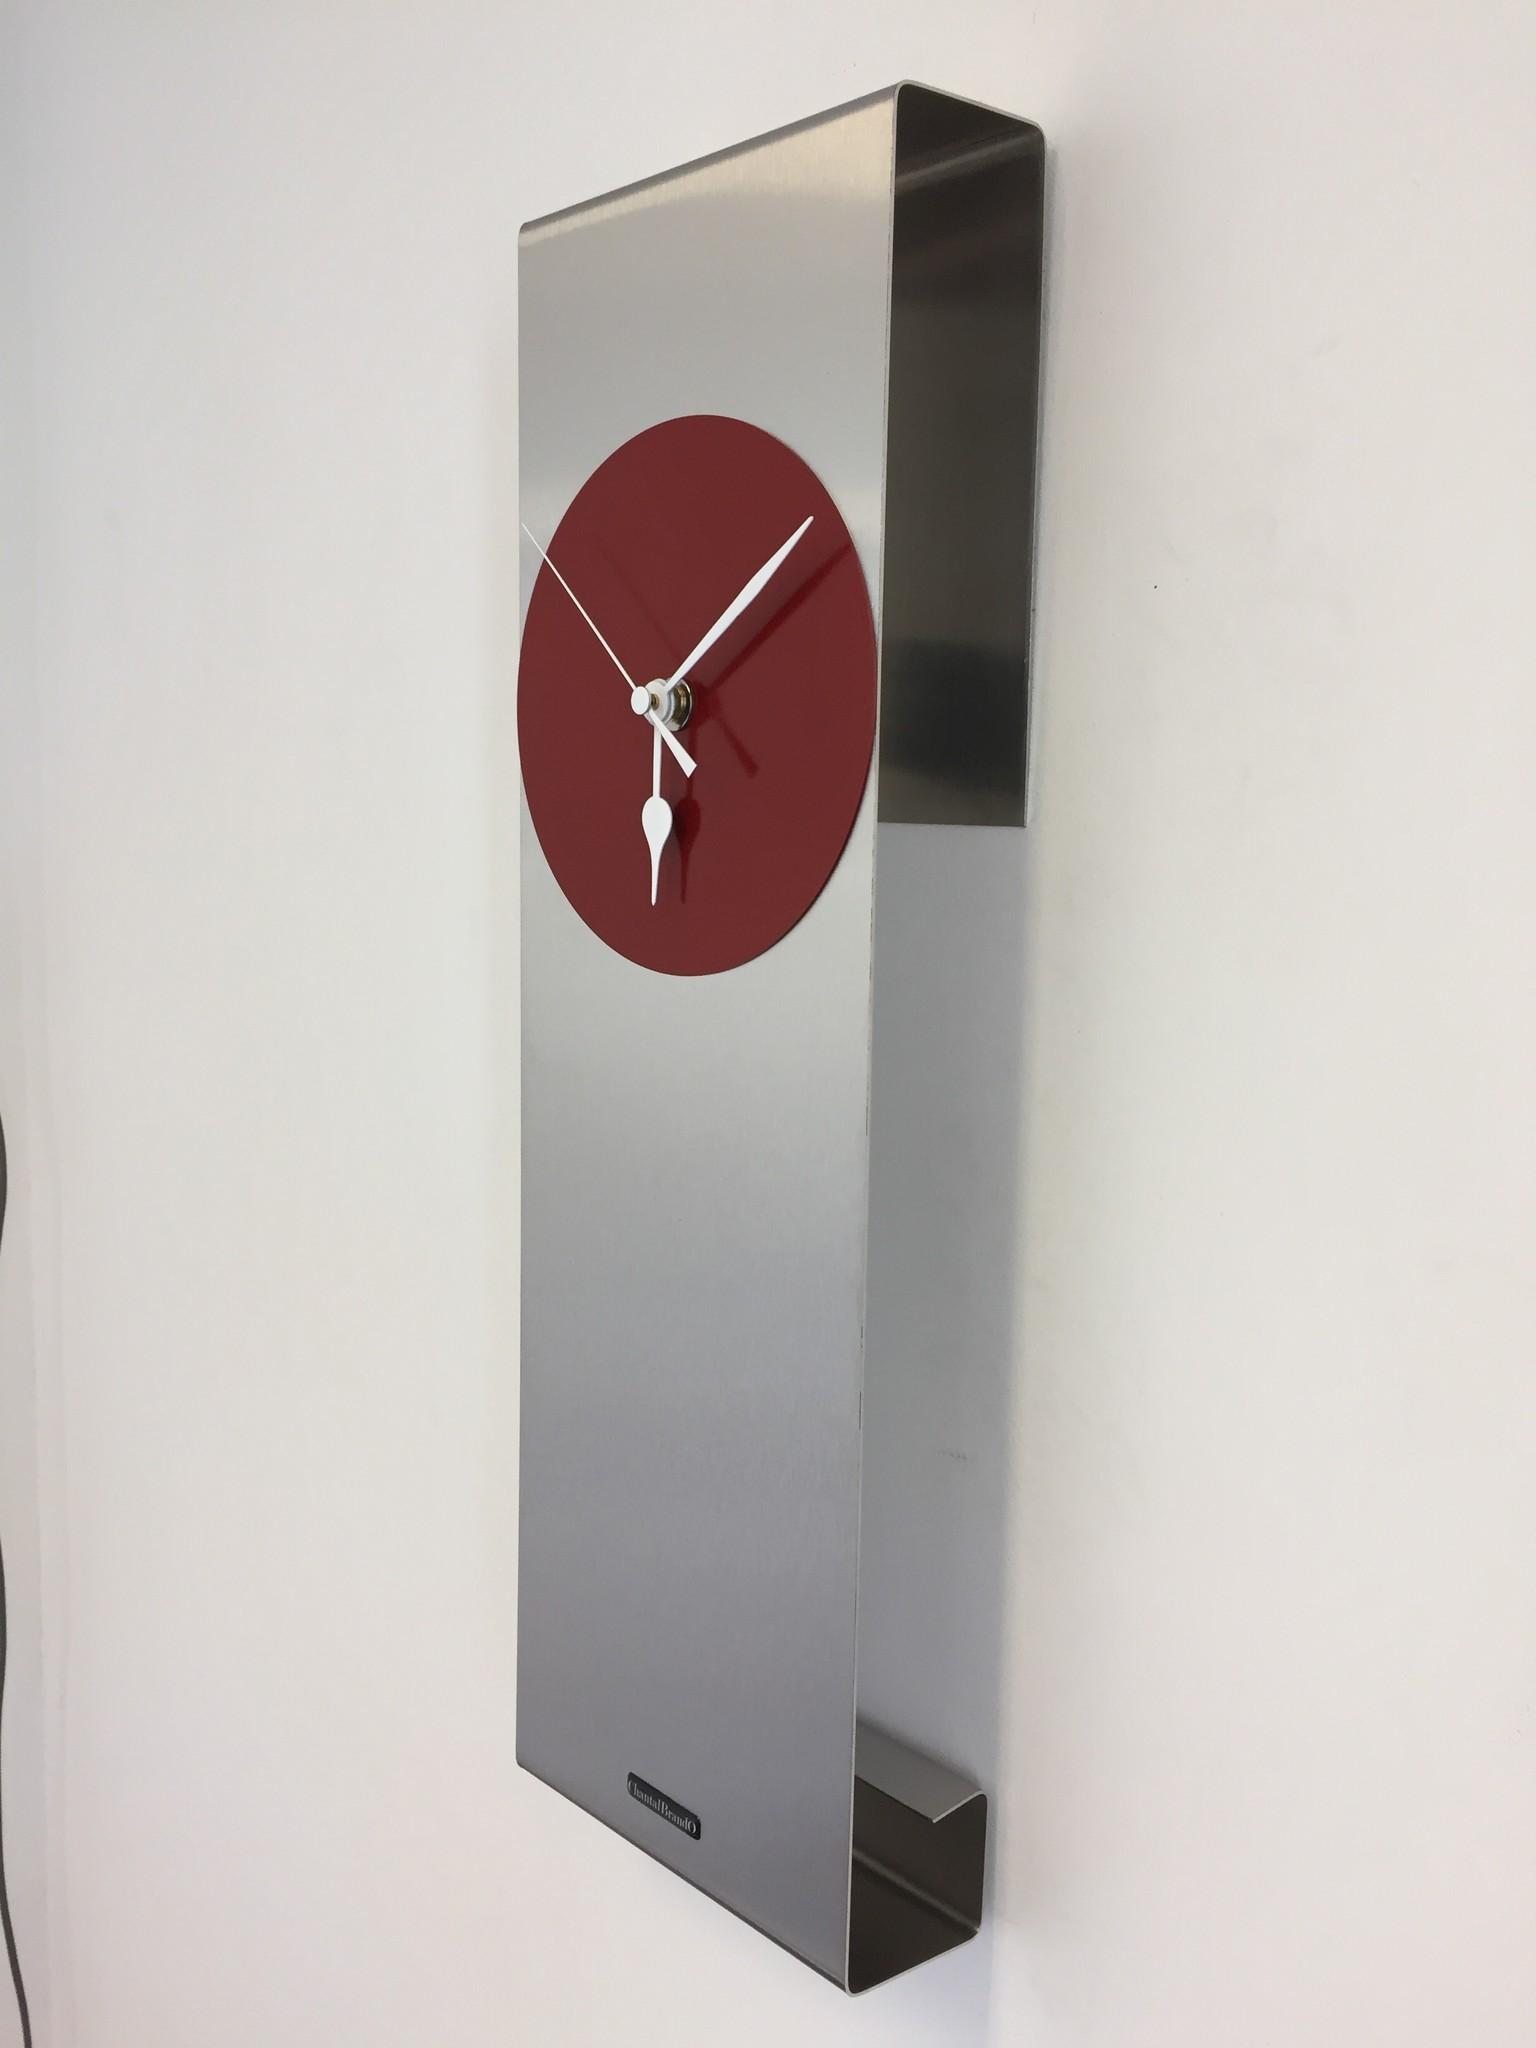 ChantalBrandO Wandklok Manhattan RED Modern Dutch Design